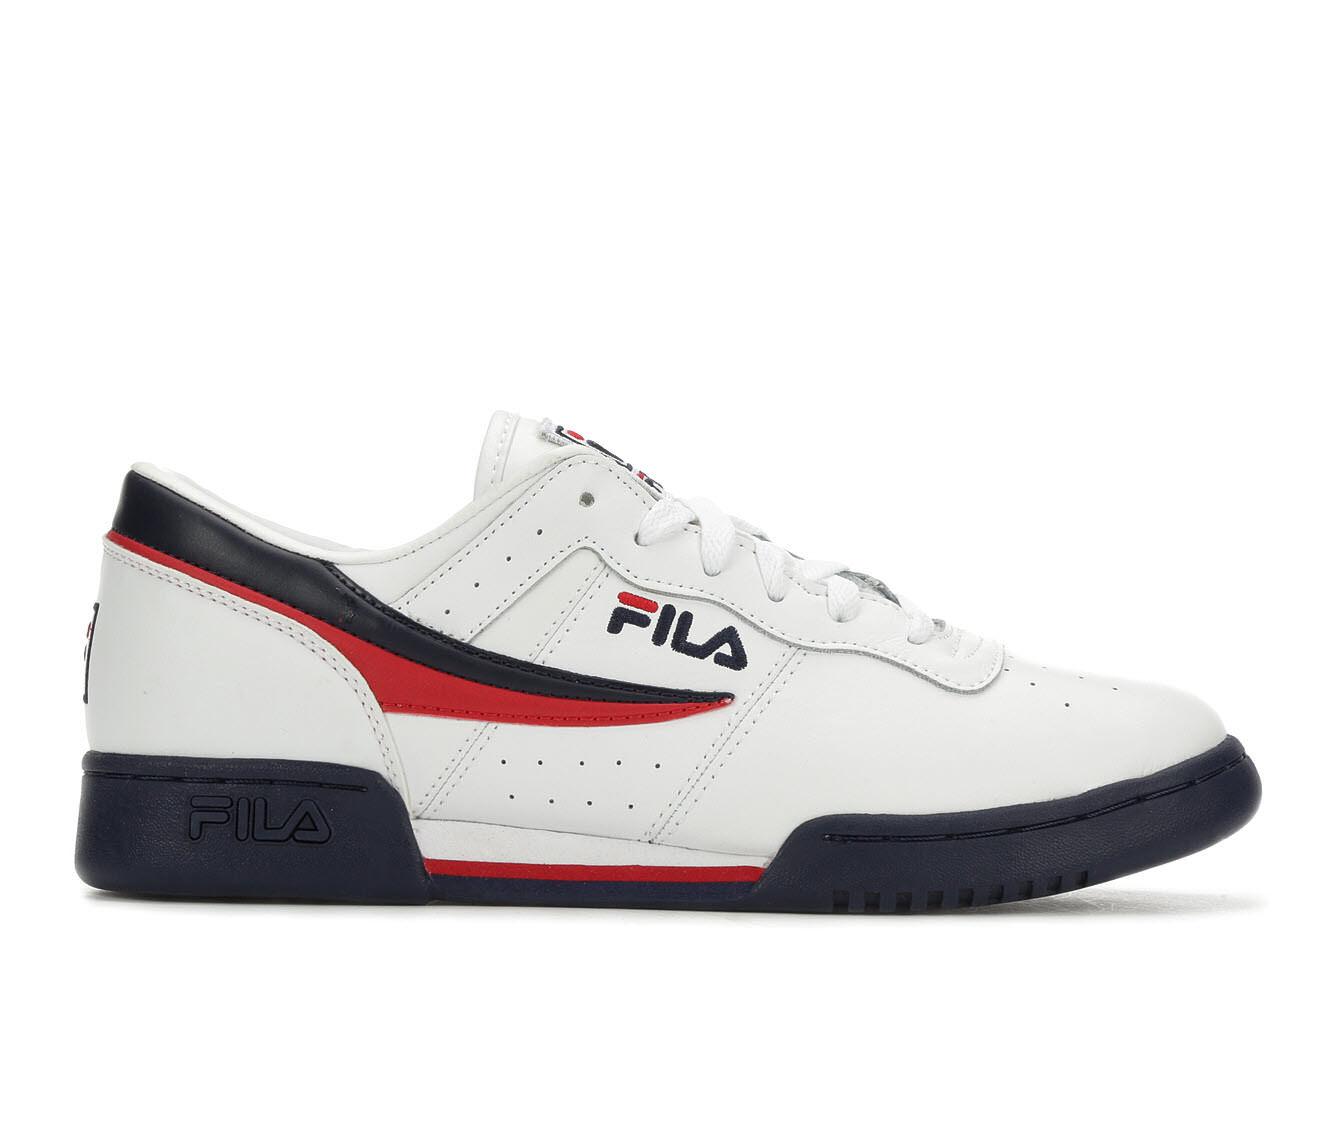 Men's Fila Original Fitness Retro Sneakers Wht/Nvy/Red